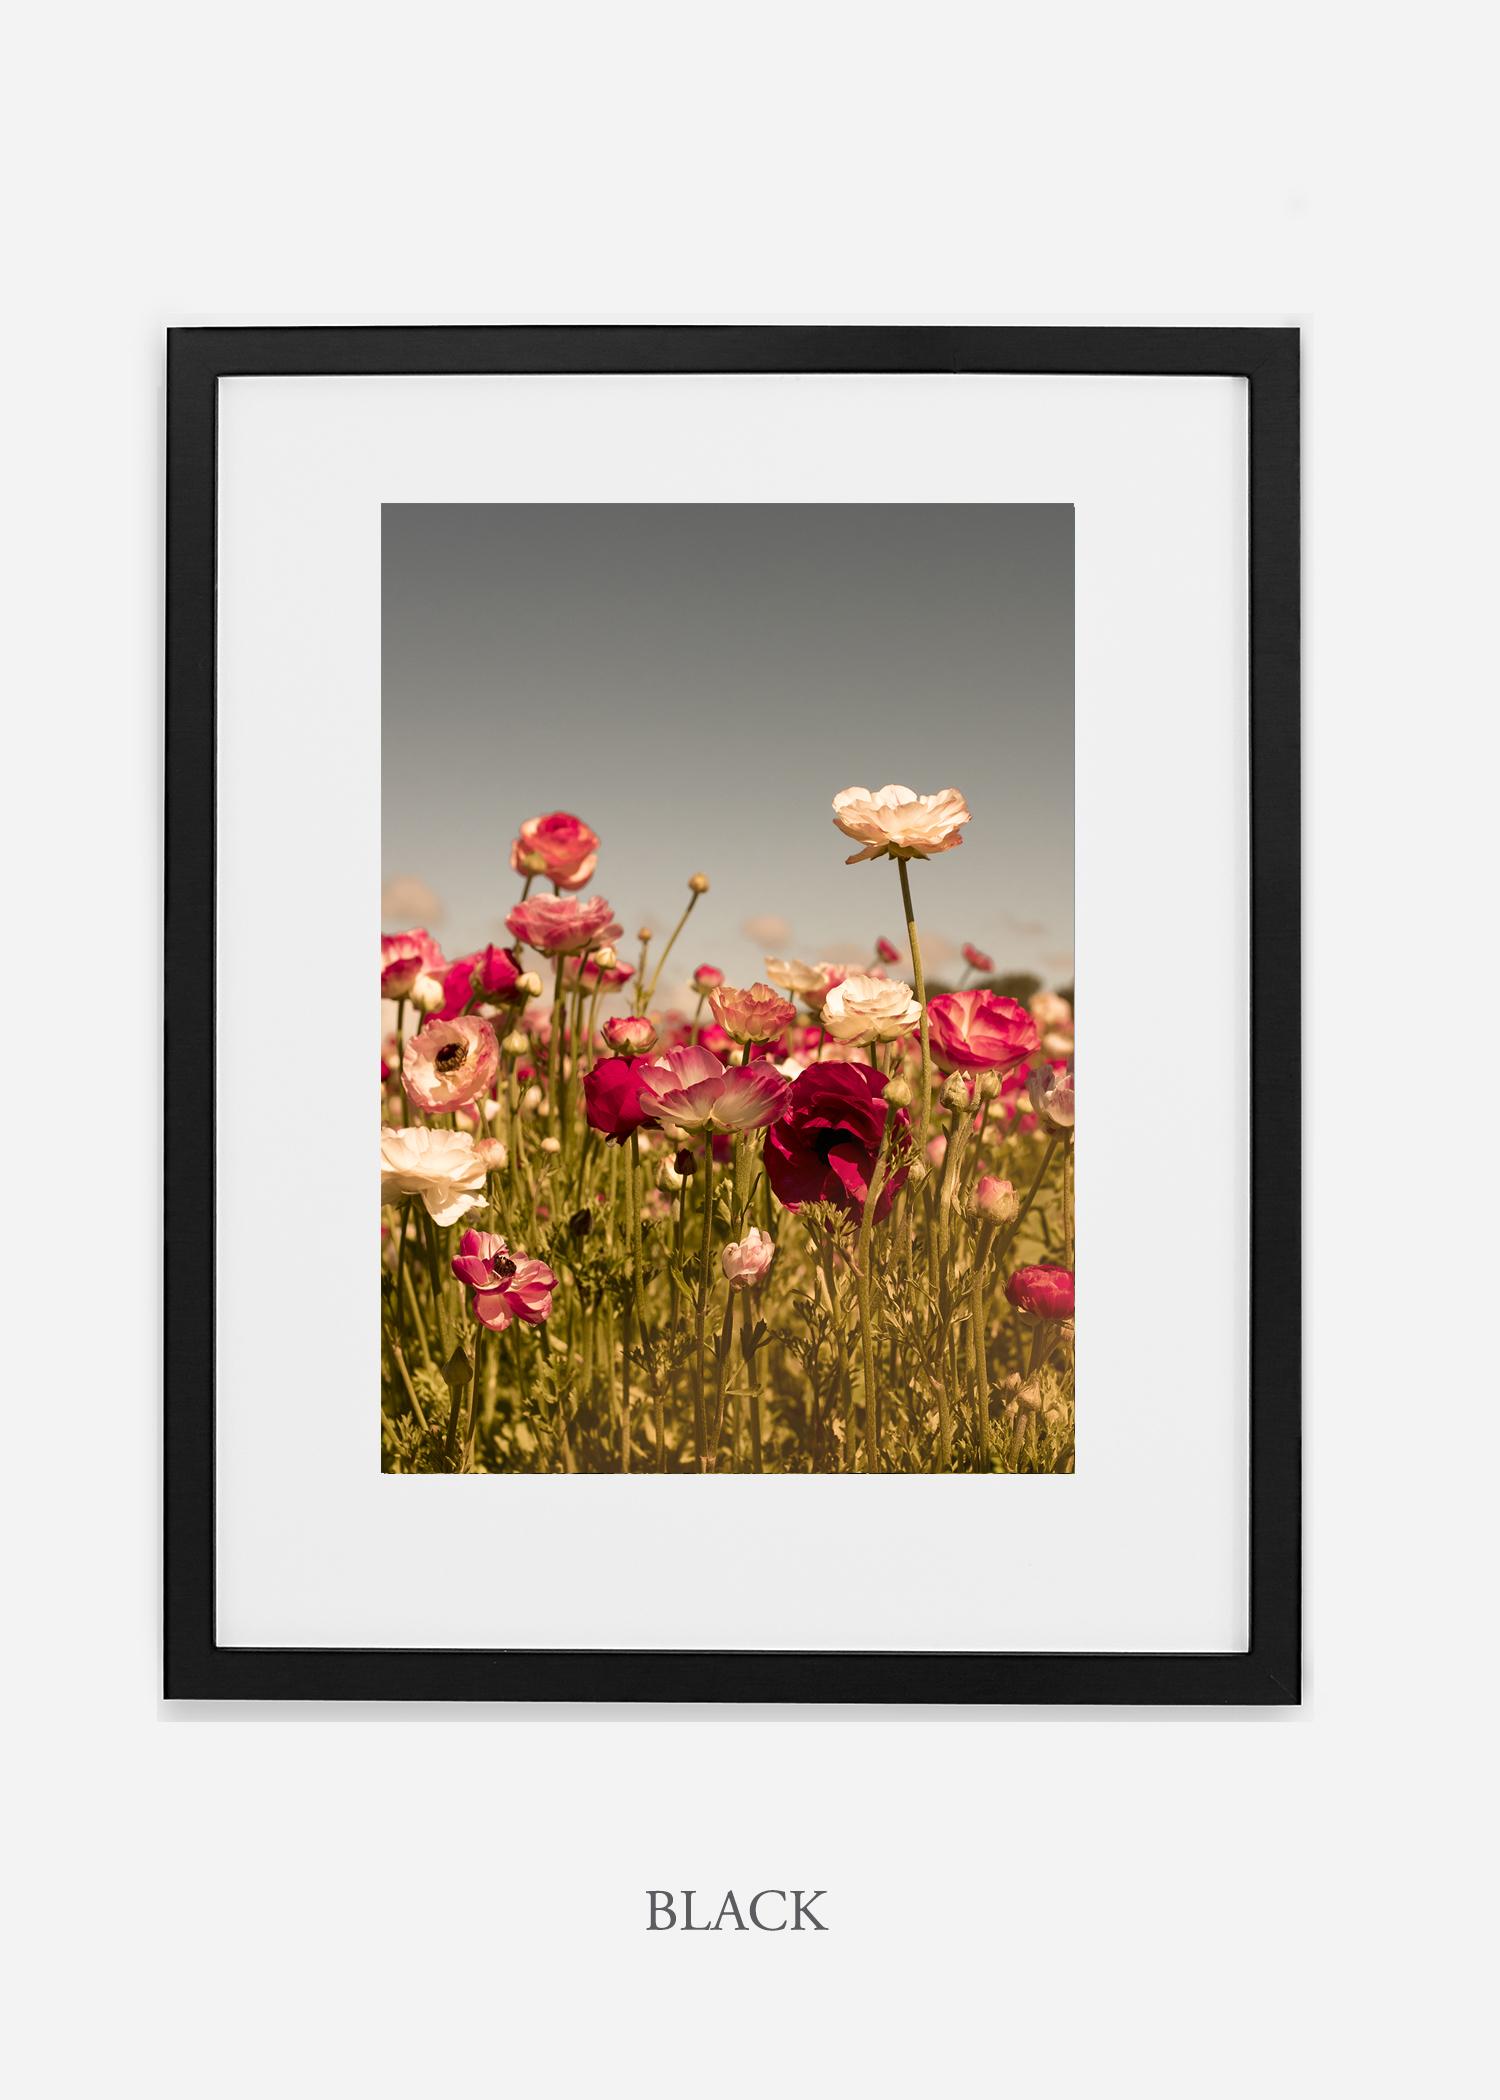 wilder-california-Floral-No.3_black-frame-mat-interior-design-botanical-print-art-floral-art.jpg